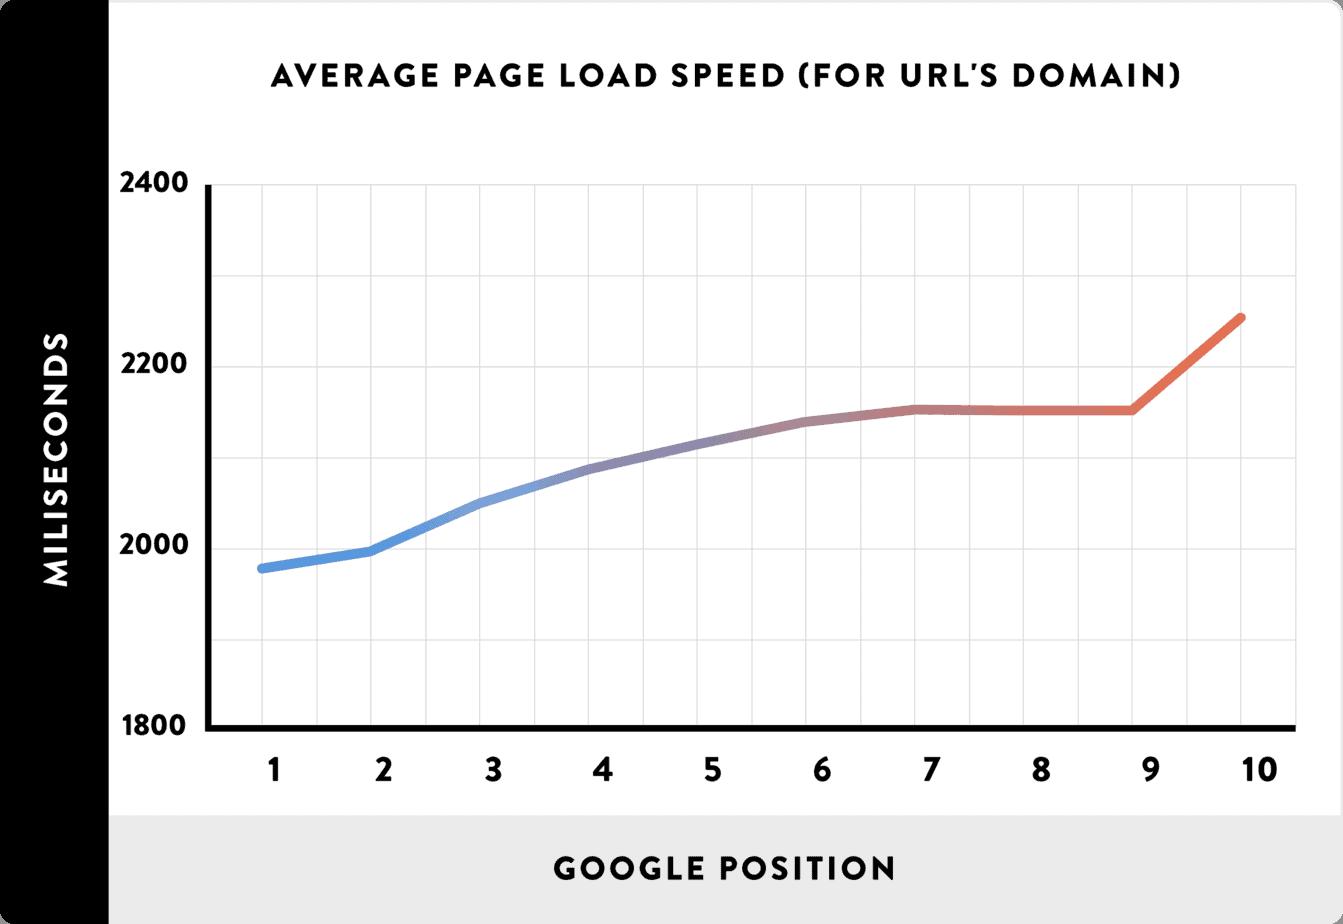 site speed correlation with ranking